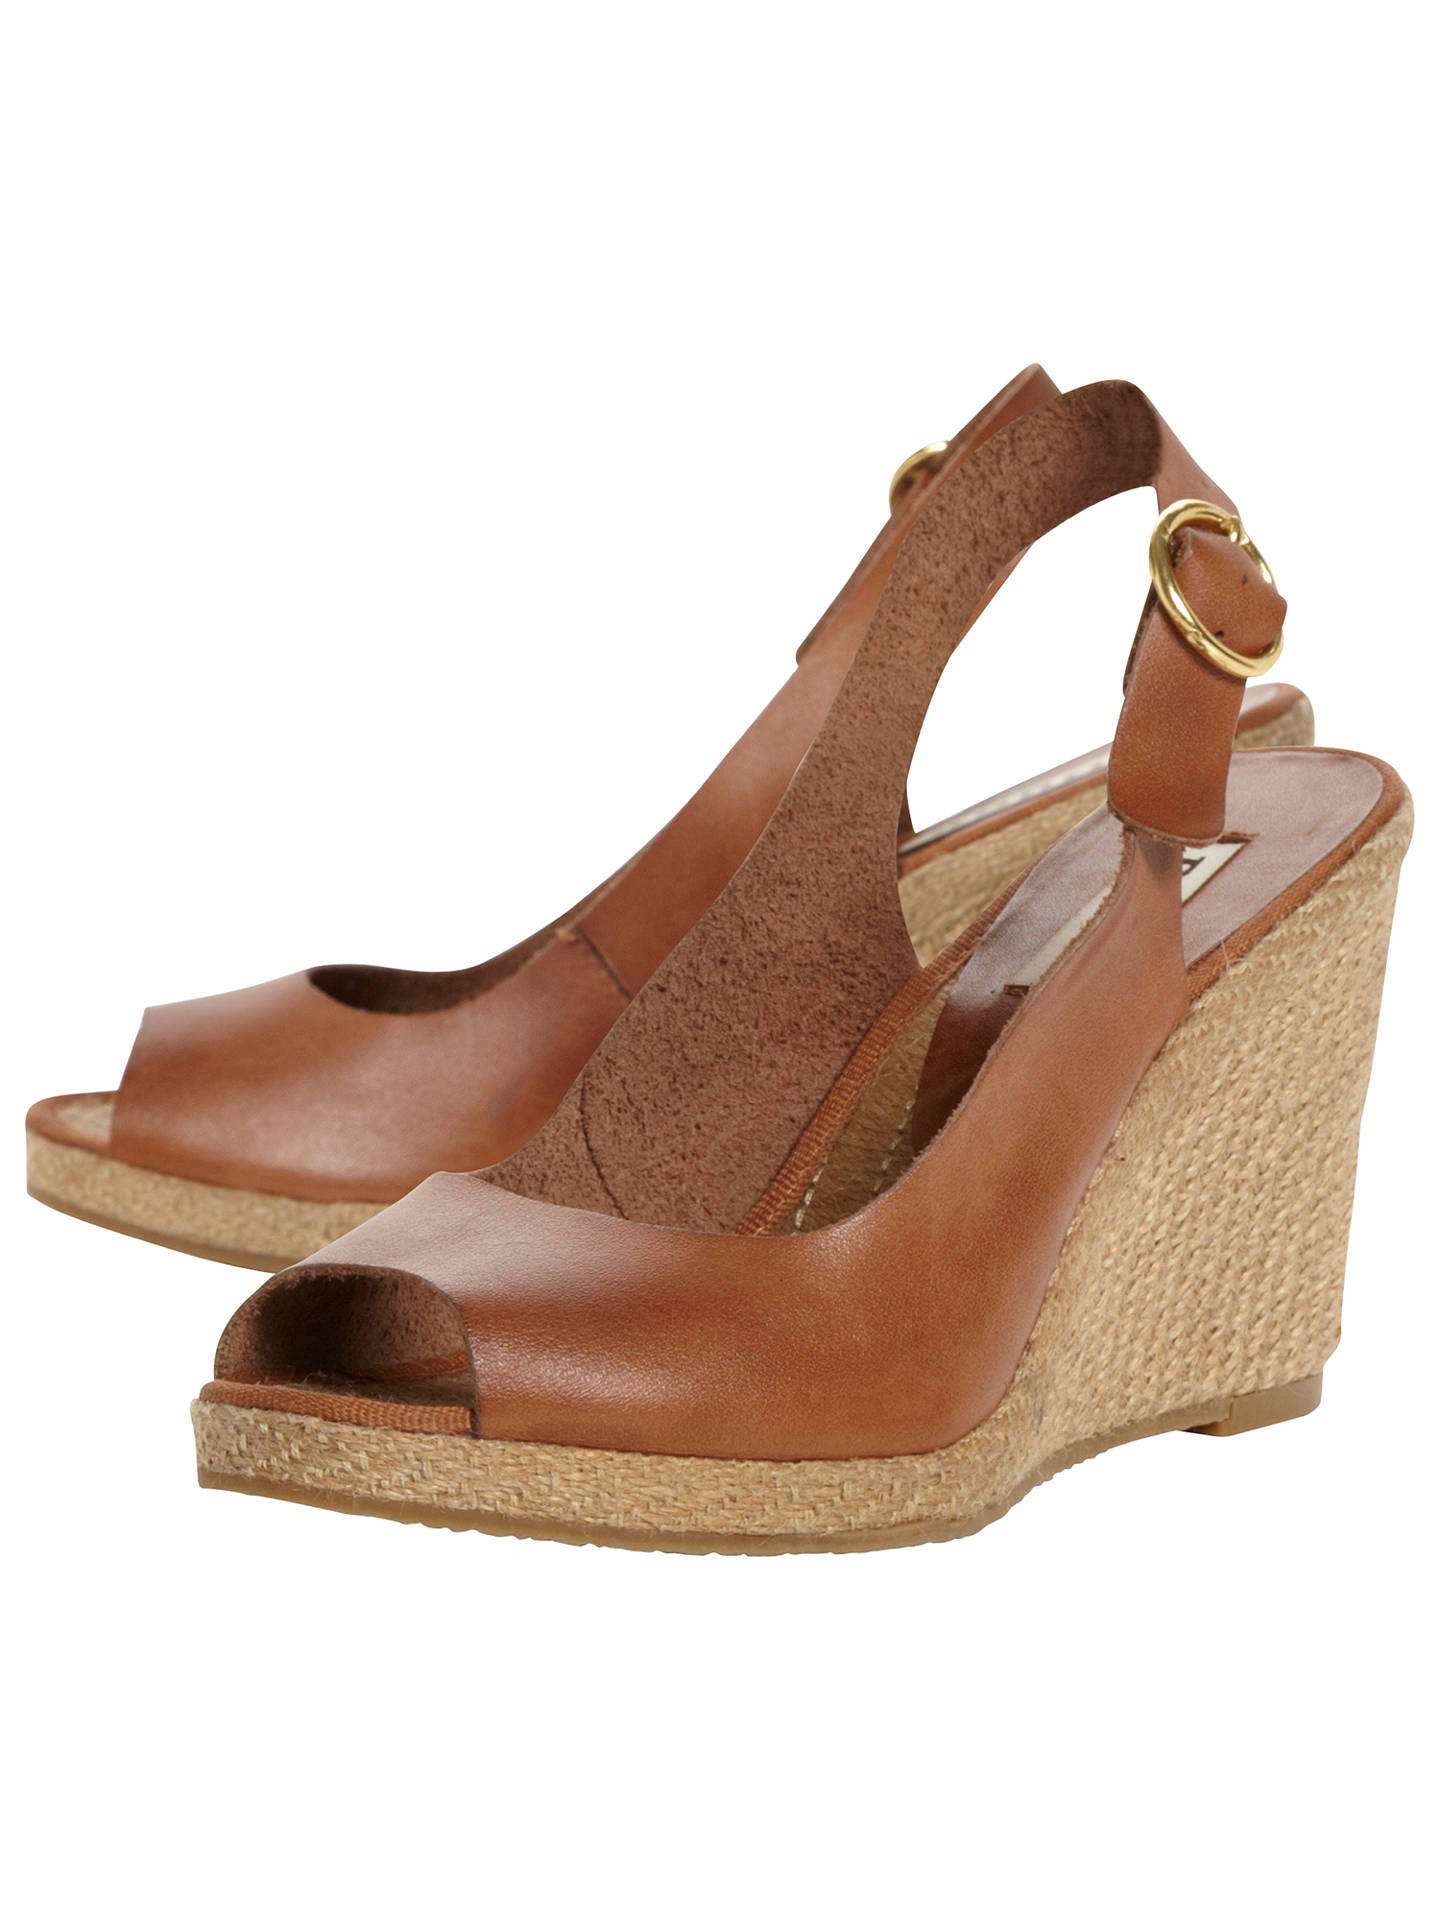 92342e4e956 Dune Gleeful Peep Toe Espadrille Slingback Wedge Sandals at John ...